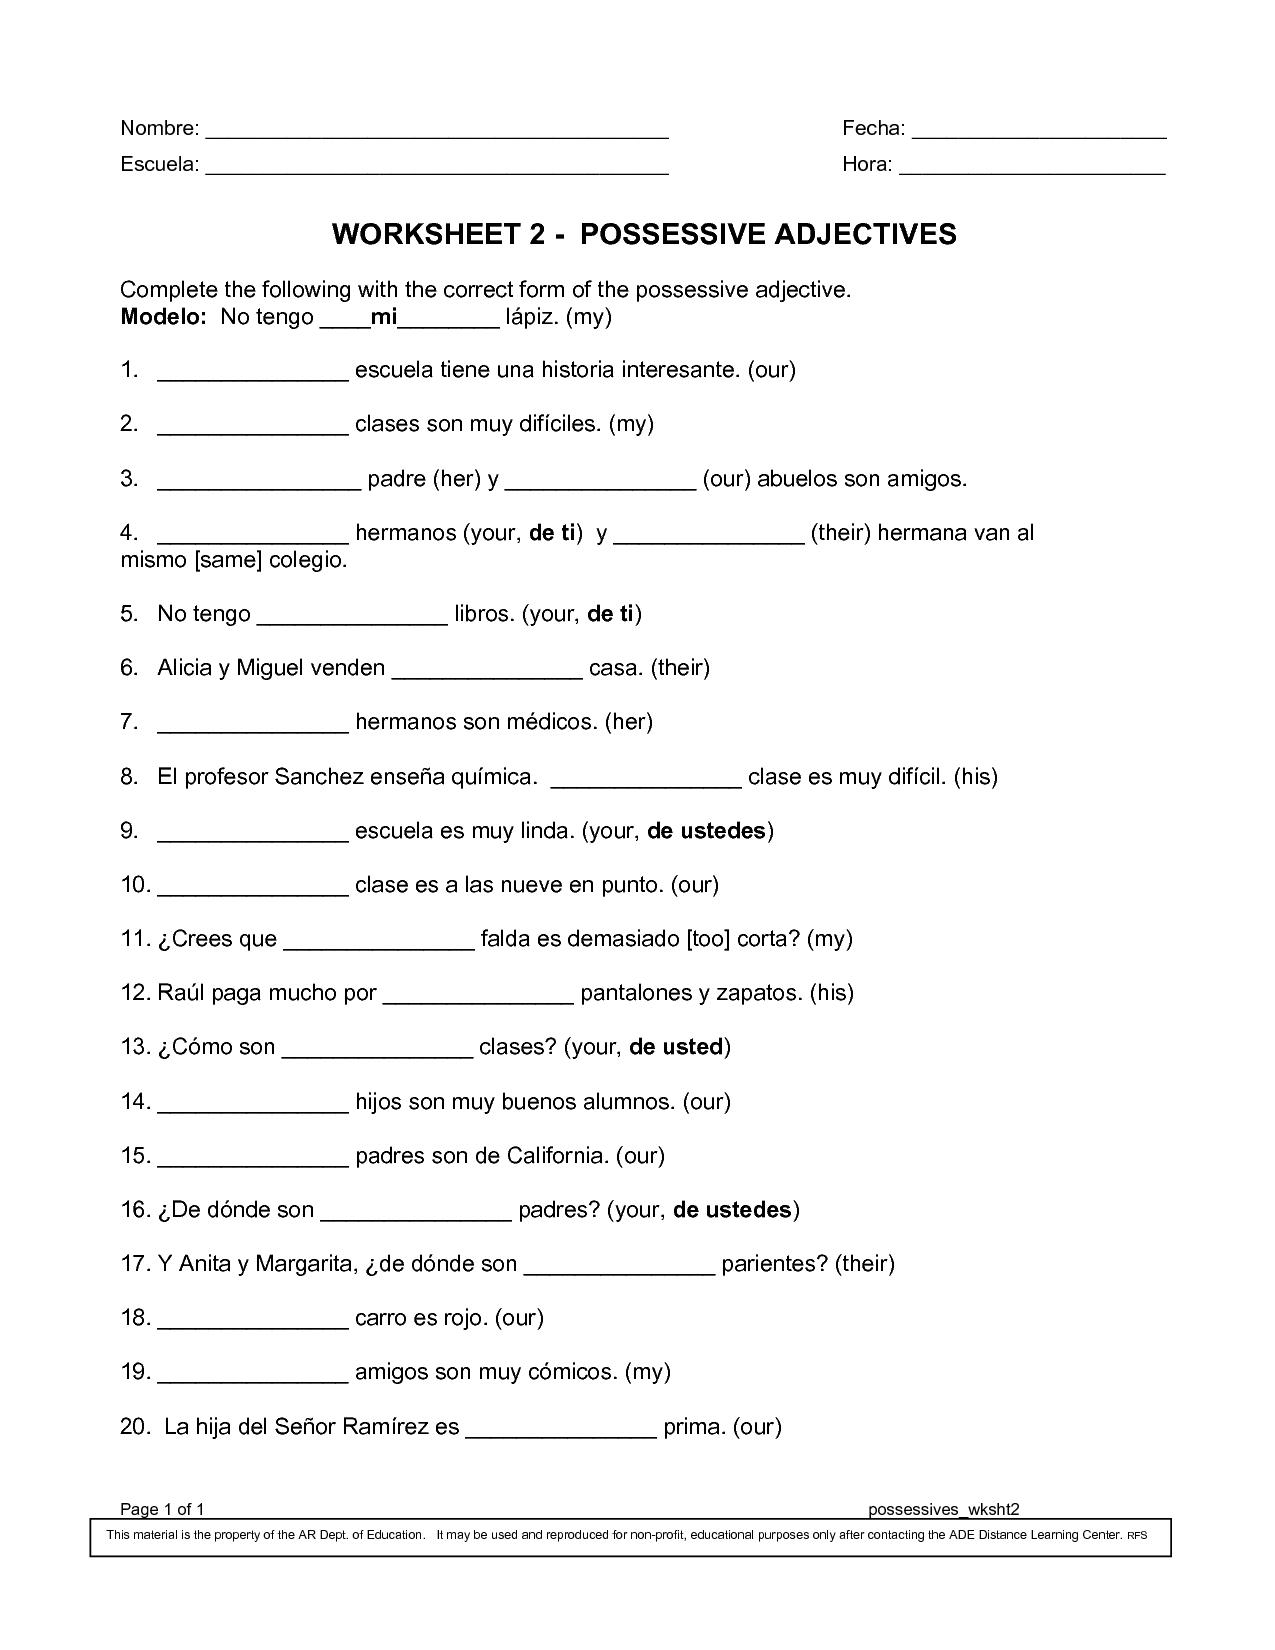 Possessive Adjectives Pronouns Worksheet